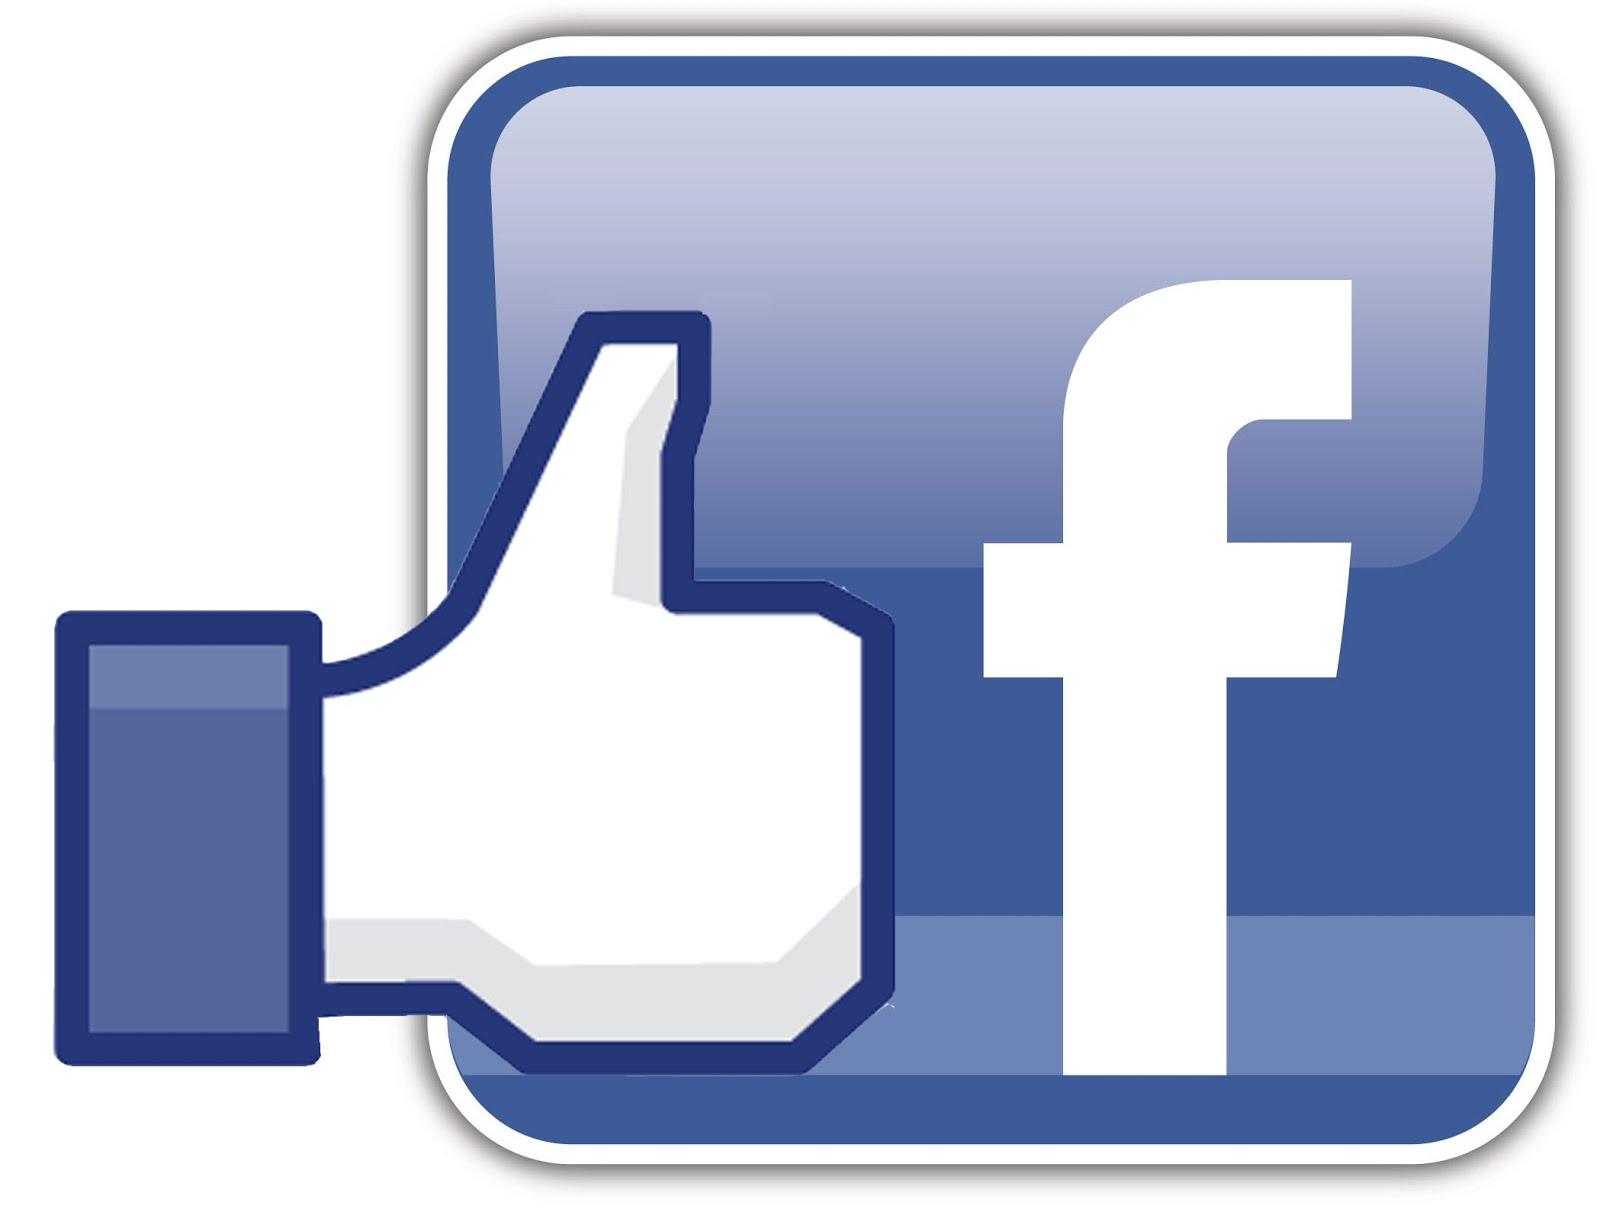 SOL Facebook